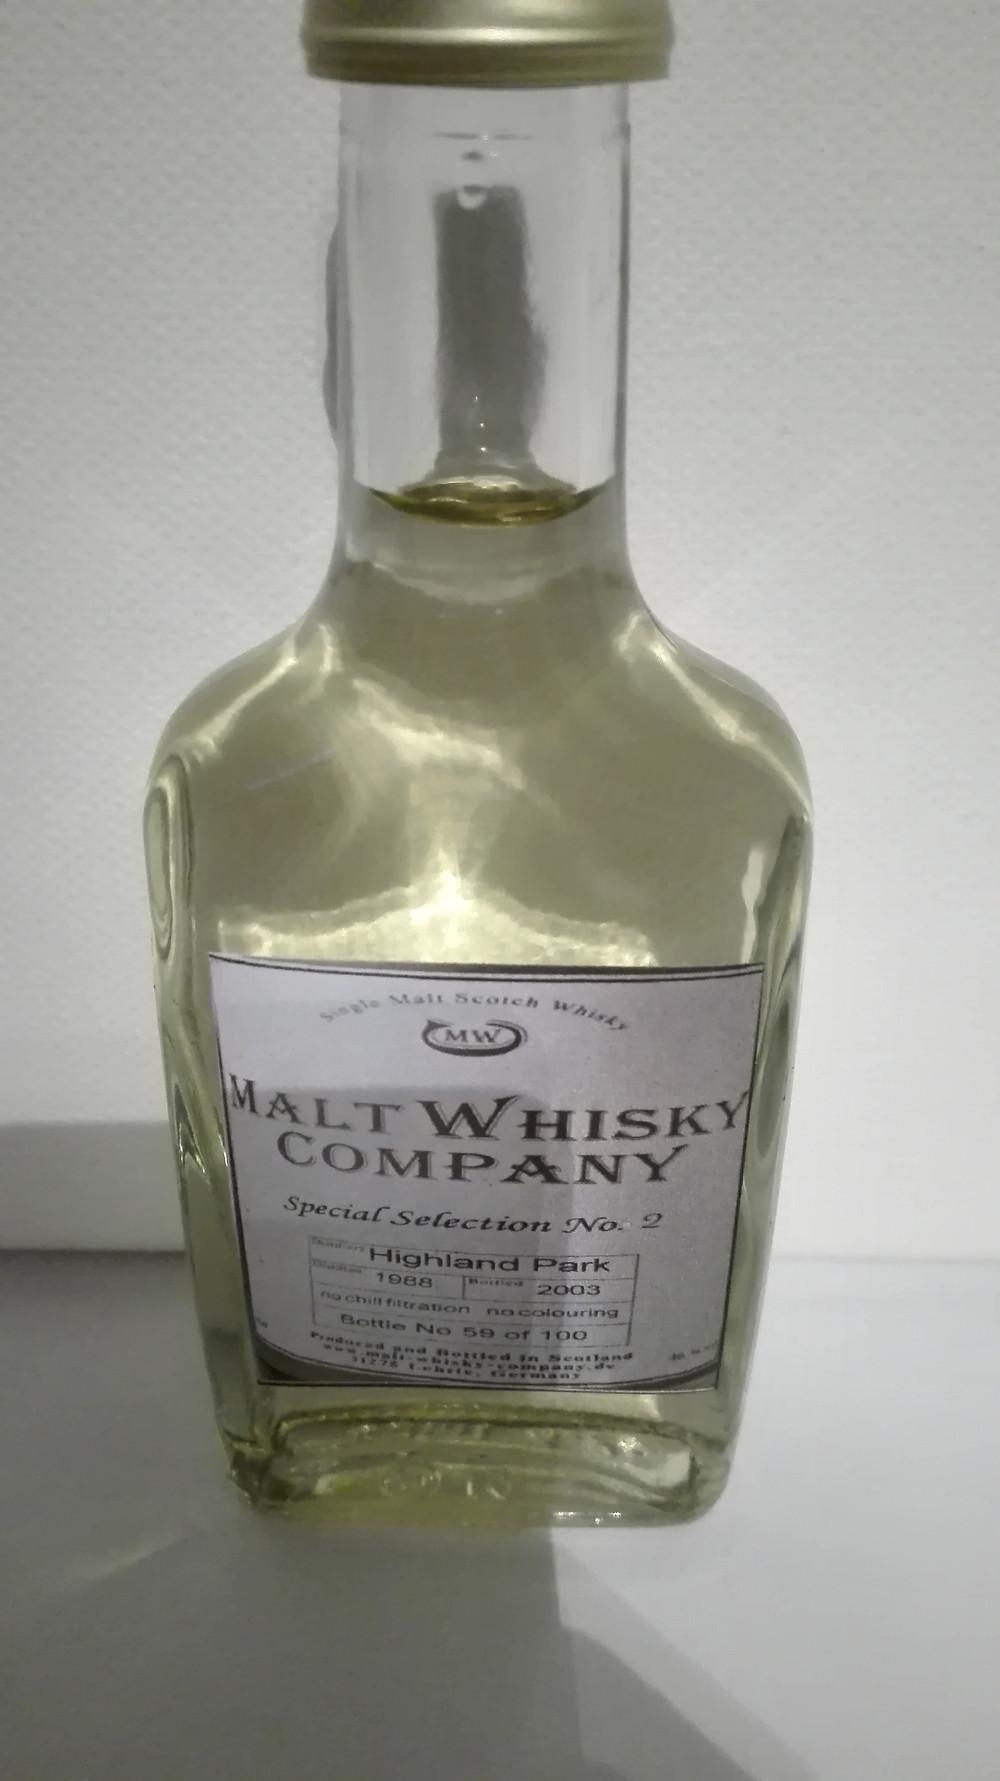 Highland Park 15, Highland Park 1988, 2003, Malt Whisky Company, MWC, Tasting, Test